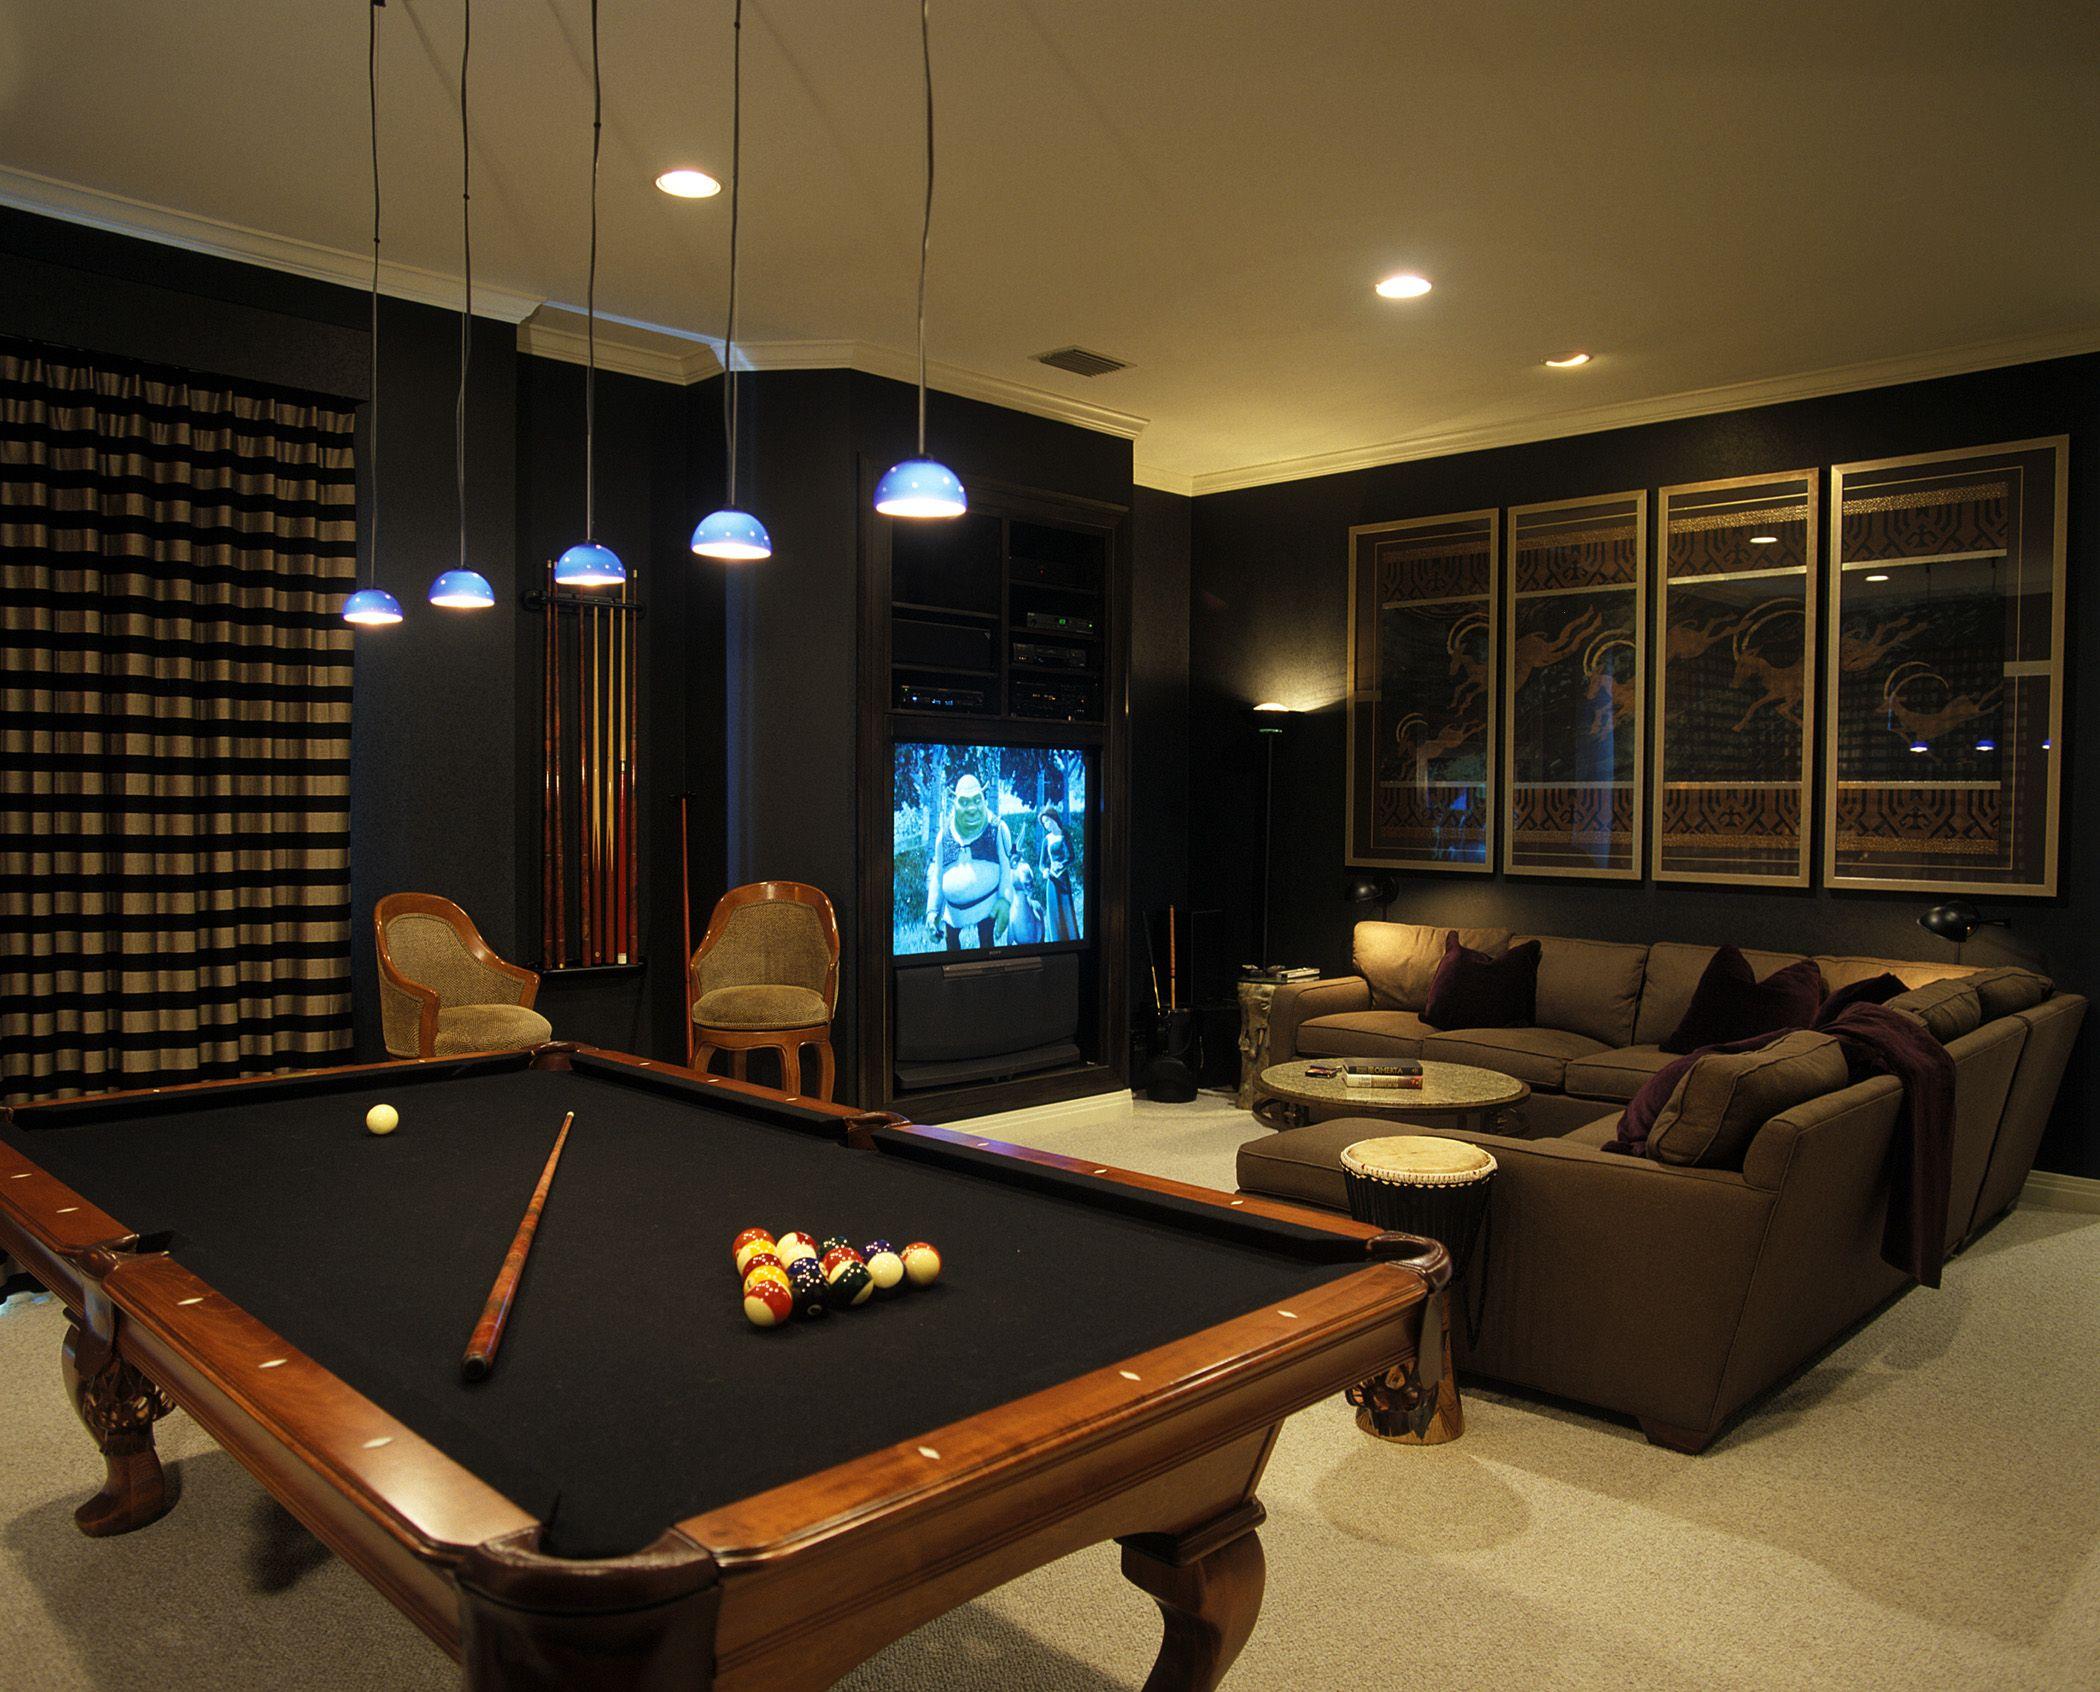 Dark media room with pool table